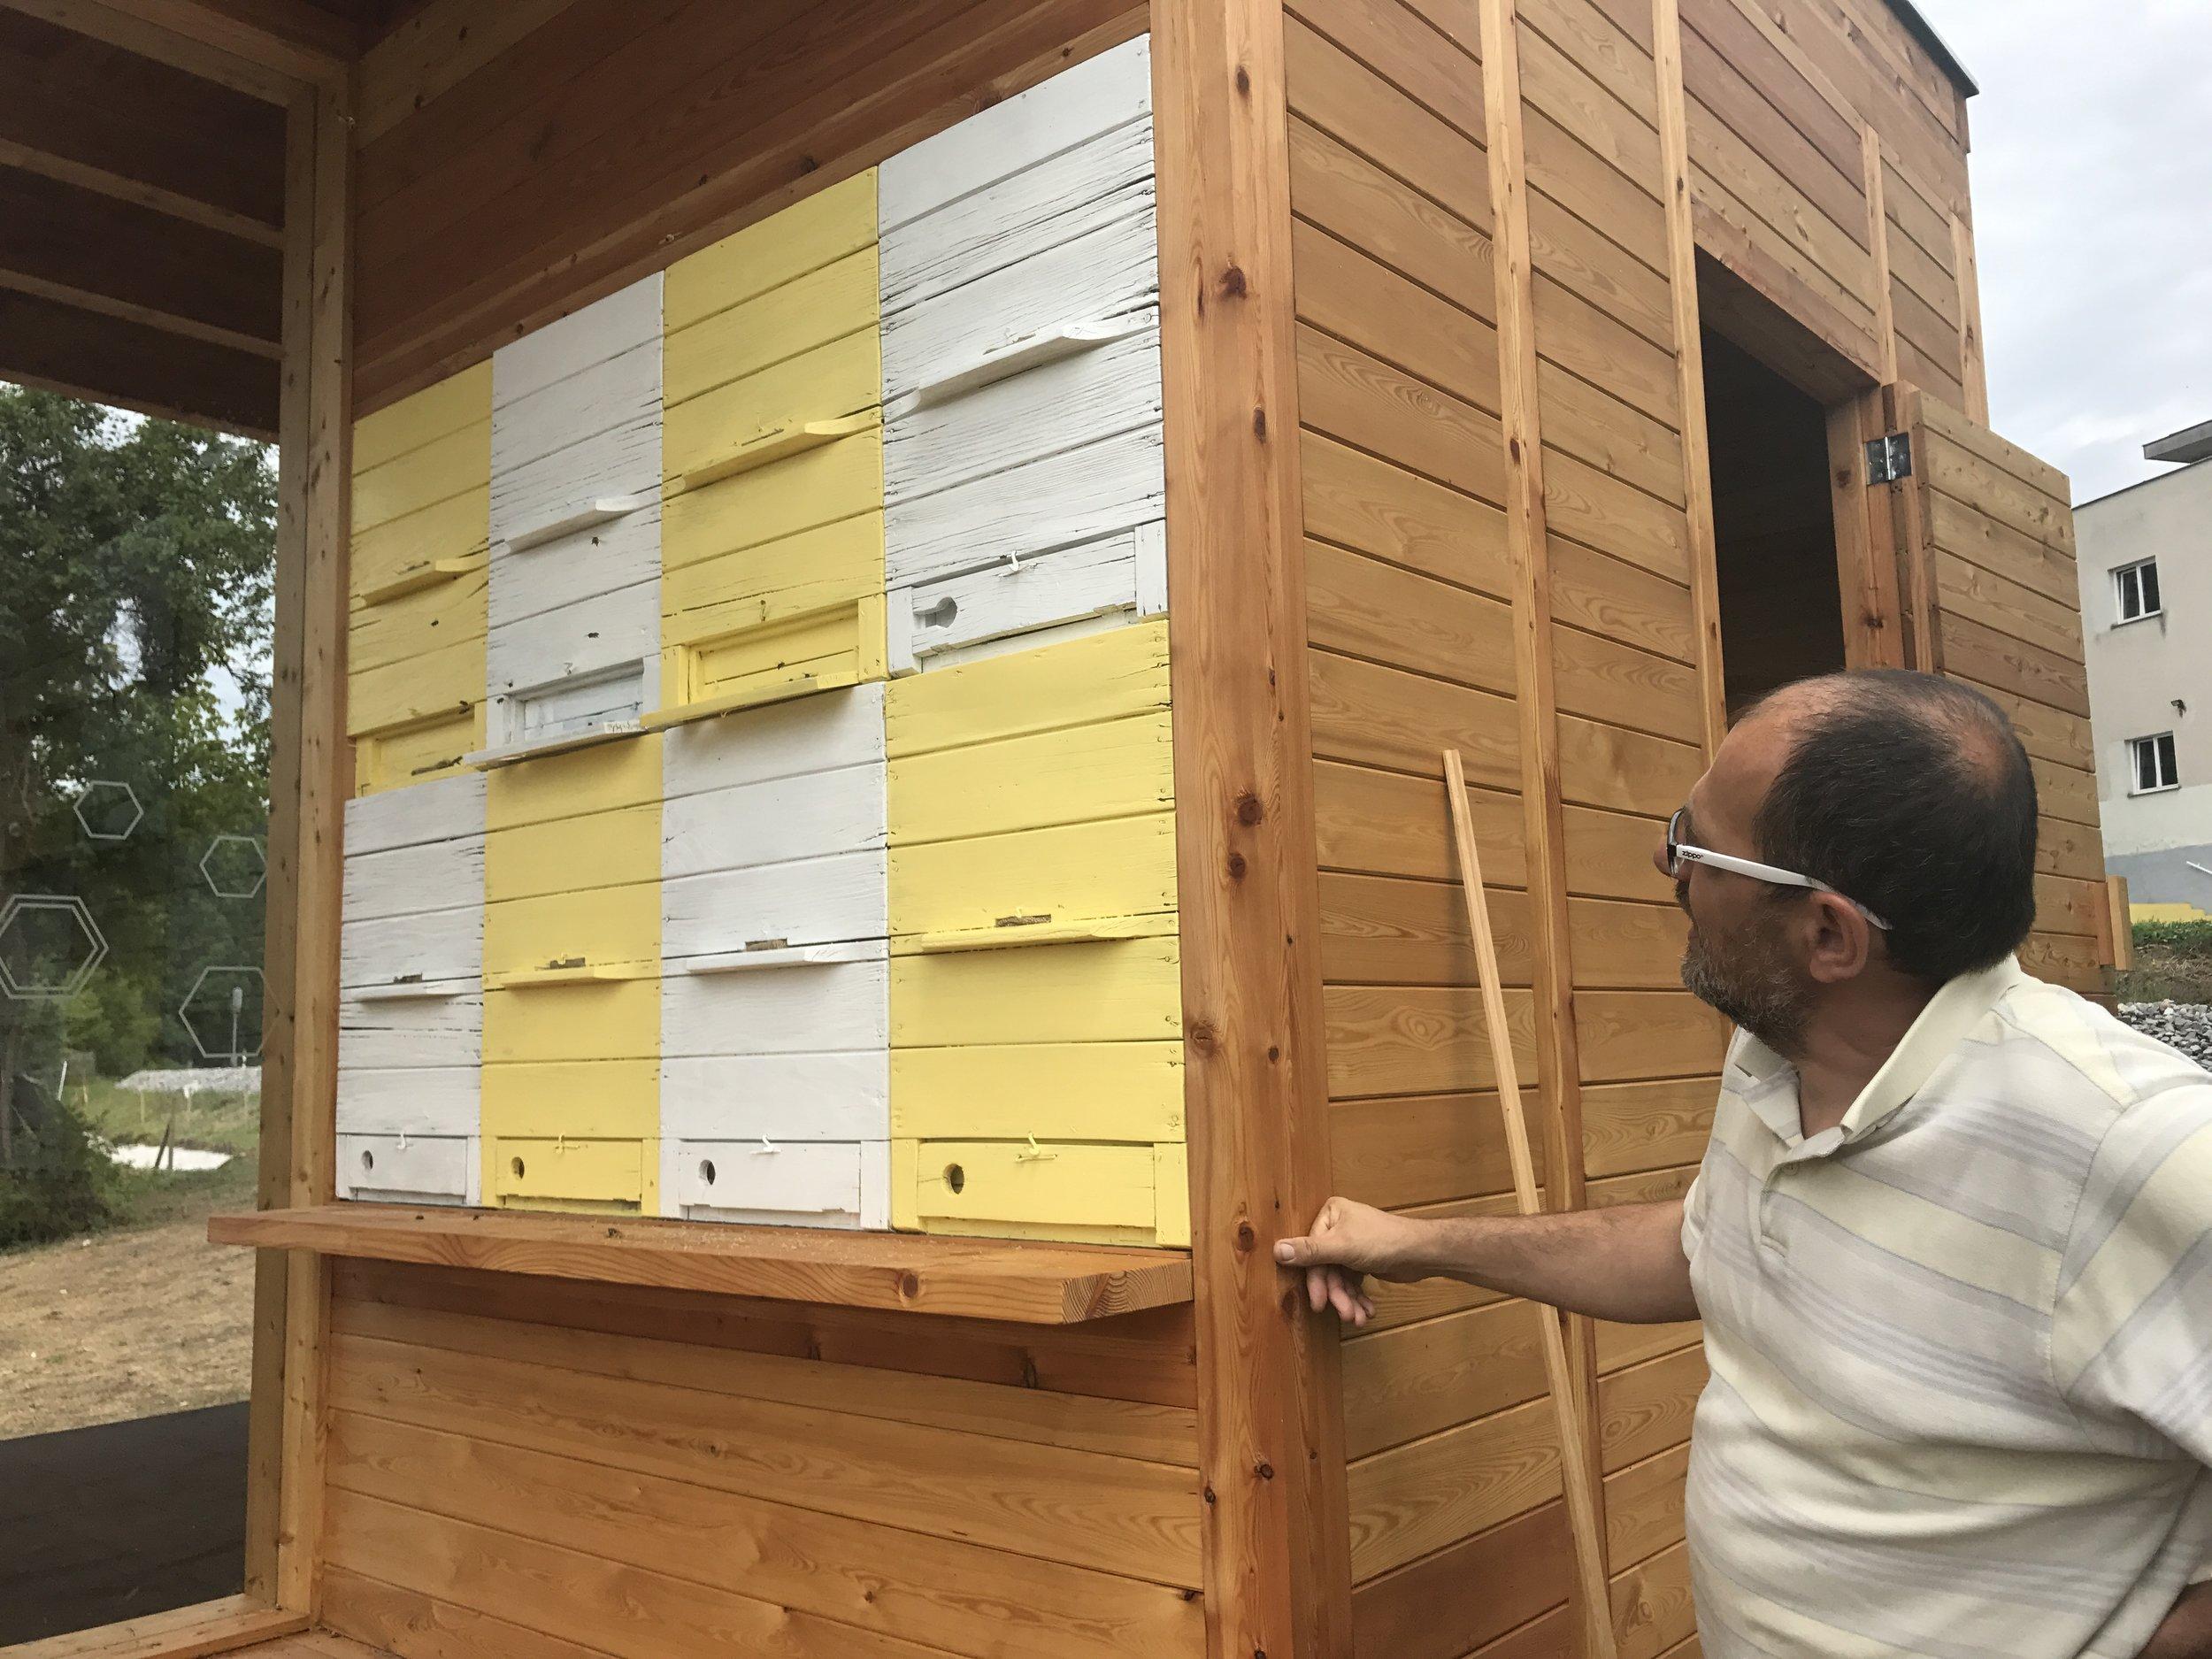 Dr. Janko Bozic checking his AZ hives